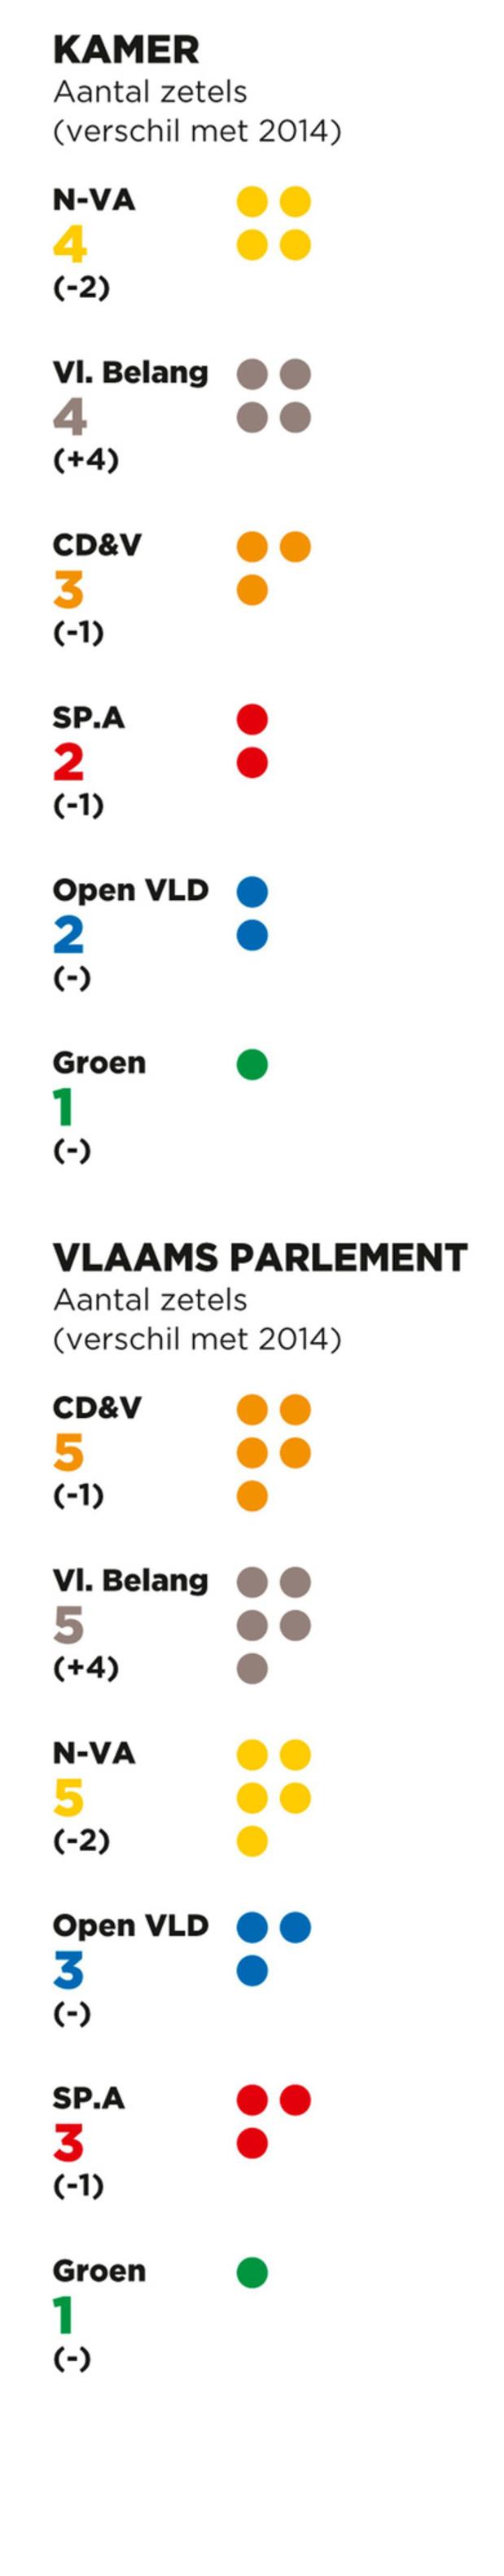 West-Vlaanderen: scores federaal en Vlaams